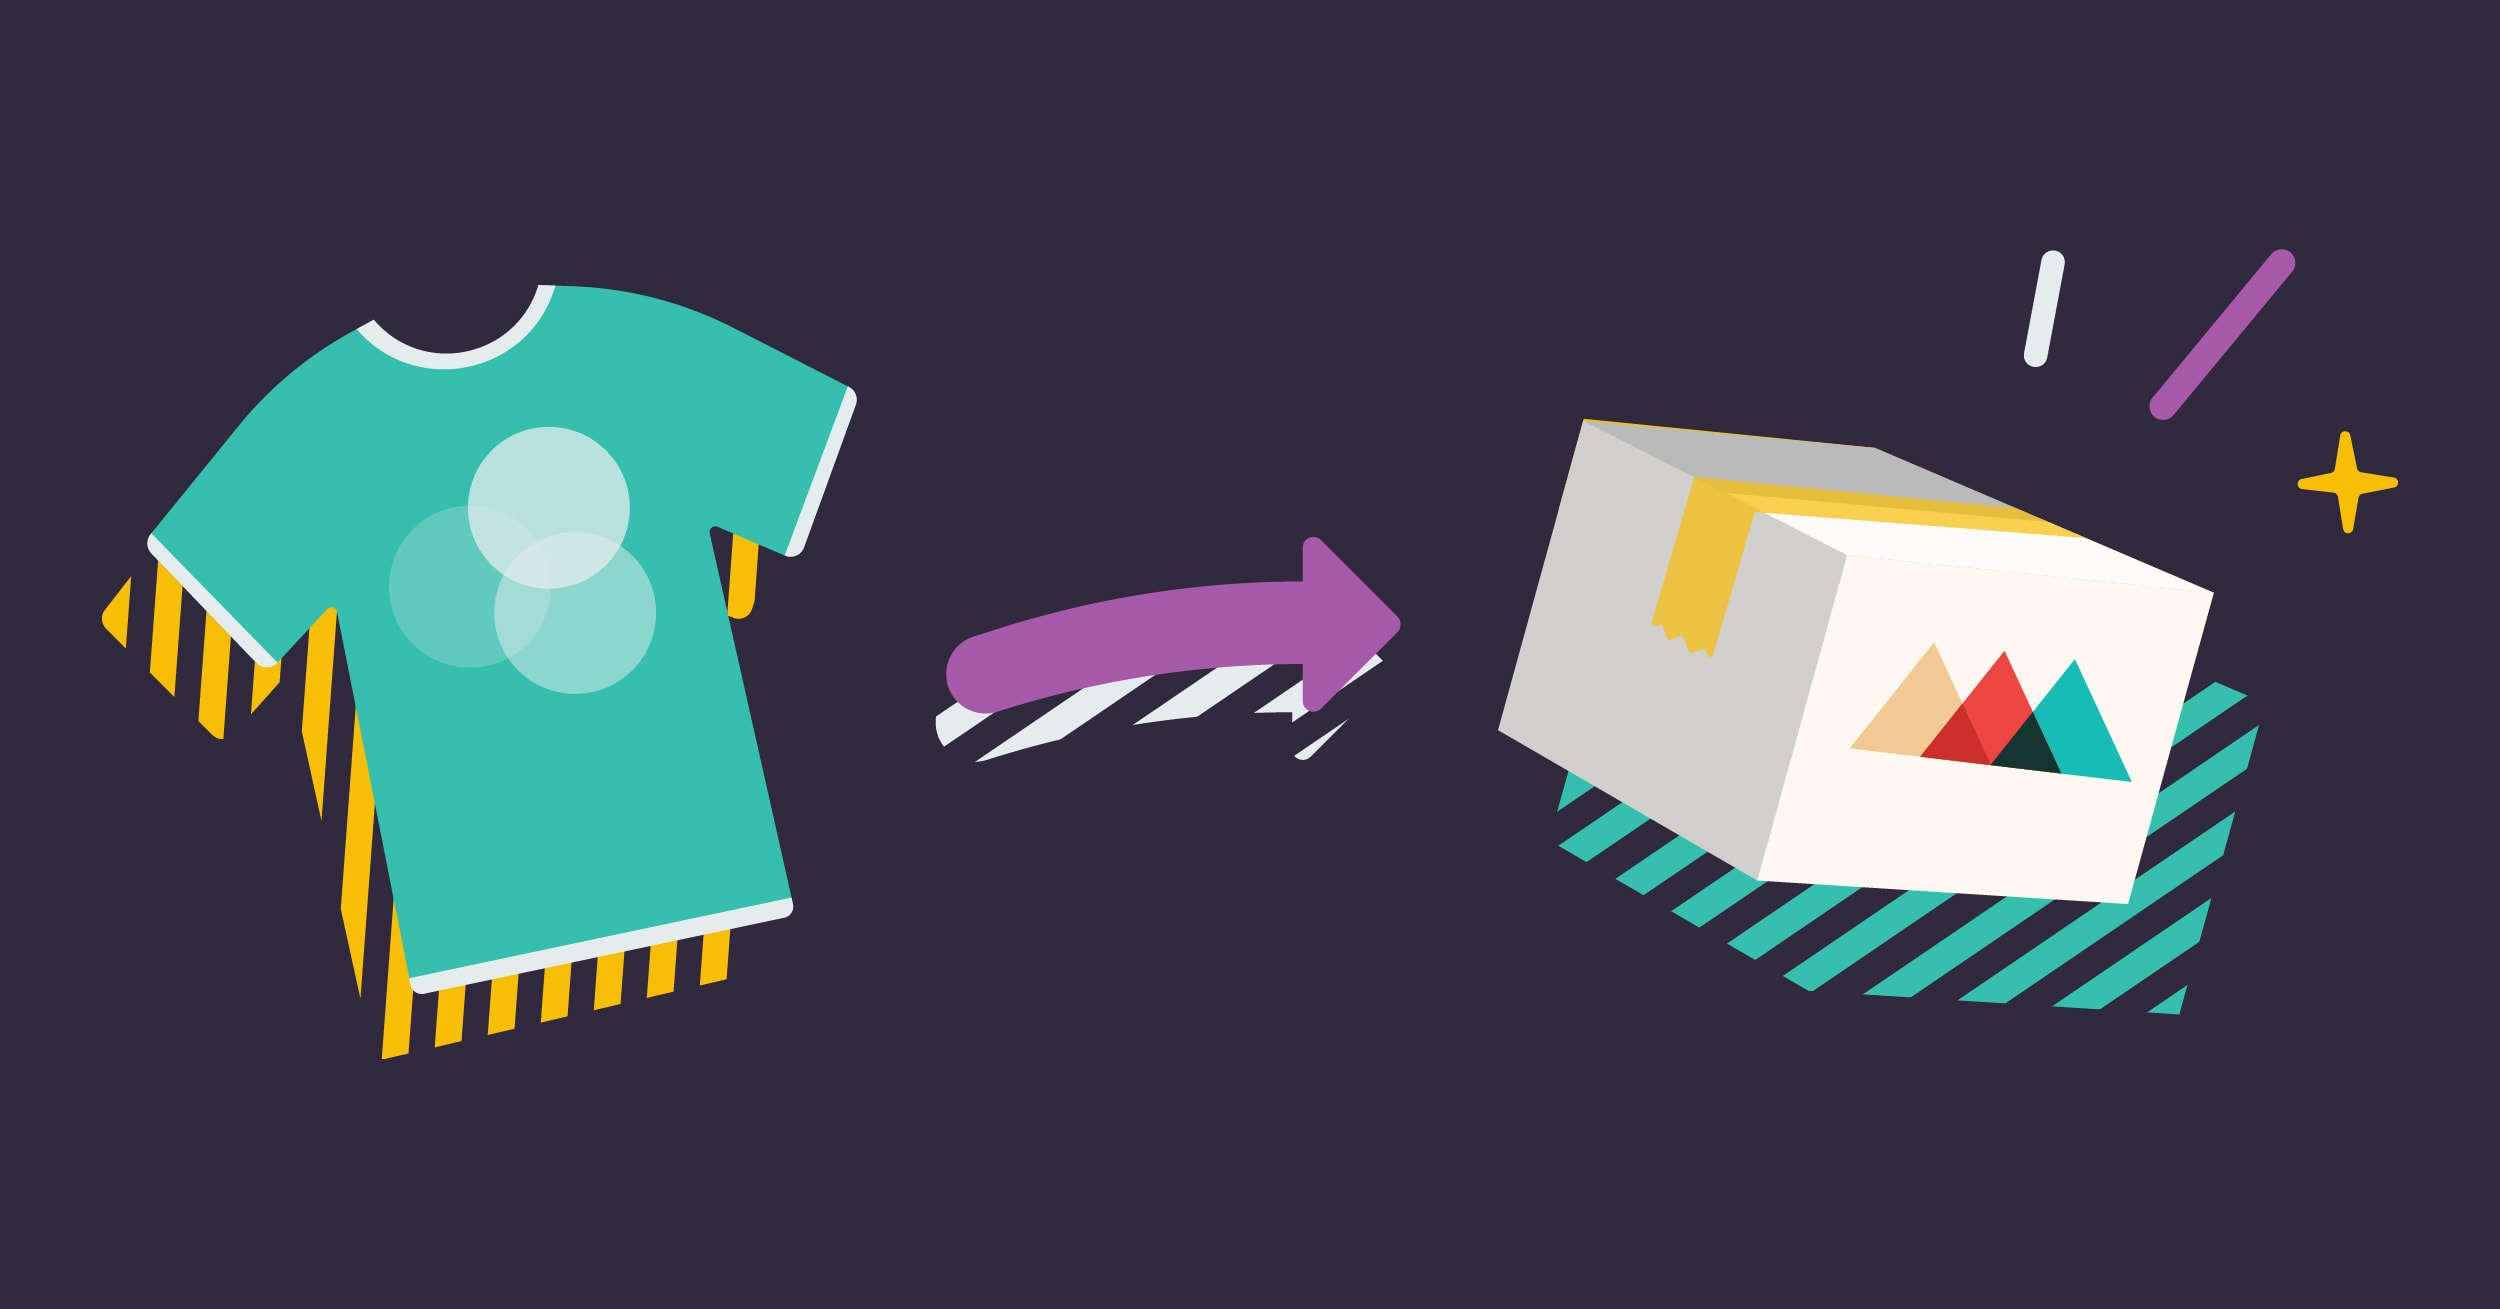 How to build a t shirt drop shipping business with printful for T shirt drop shipping companies